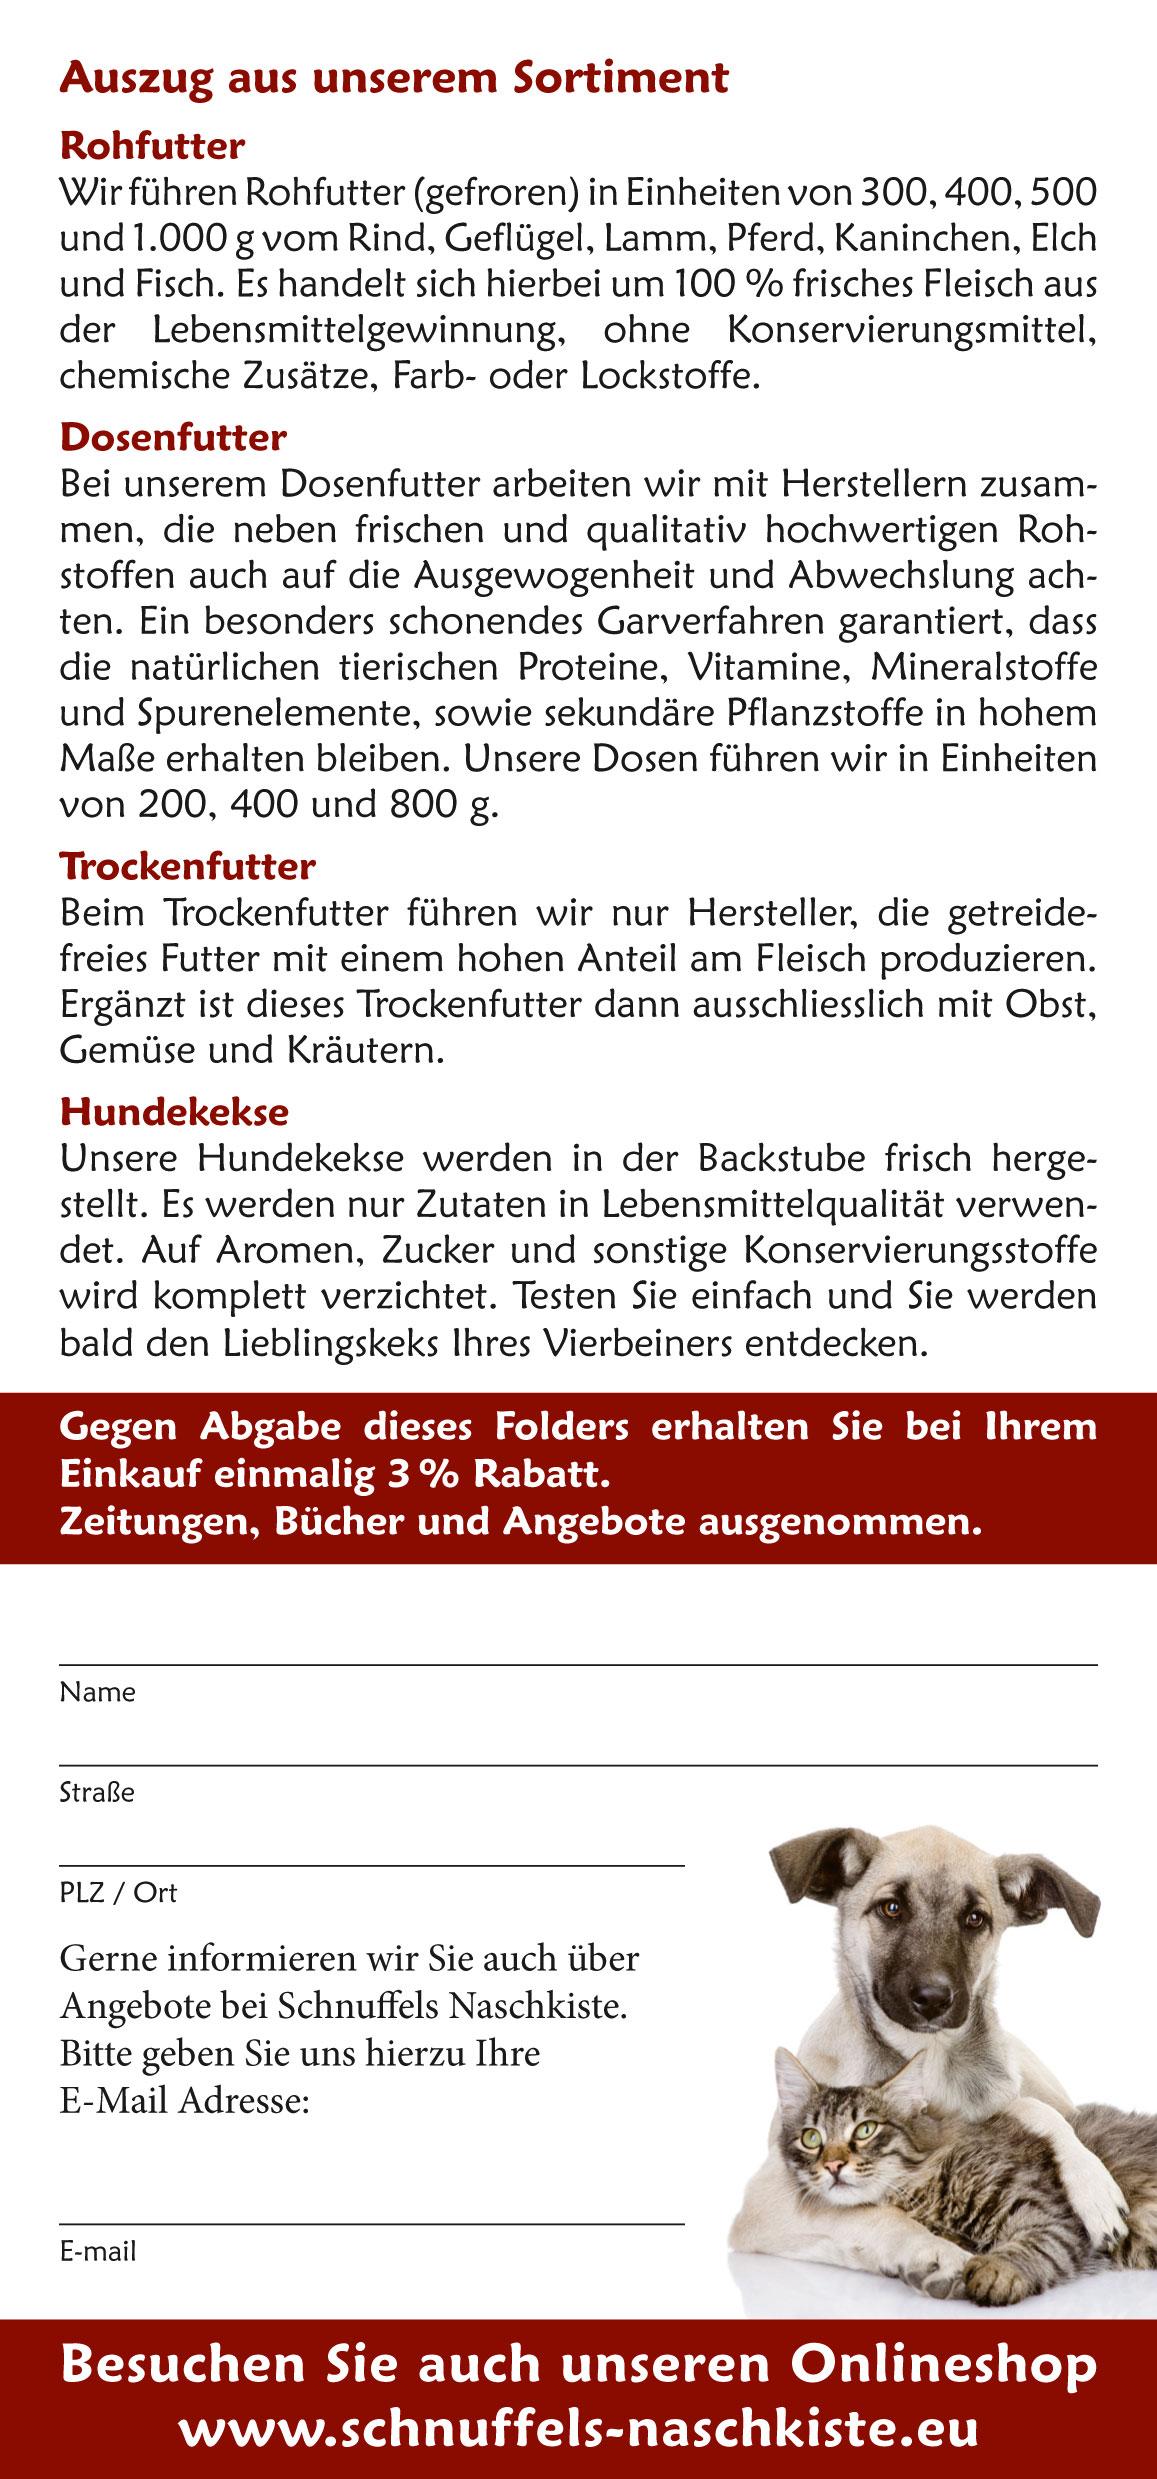 Auszug Aus Büchern Oder Stoffen flyer schnuffels naschkiste oberhessenschau 2 pankalla grafik